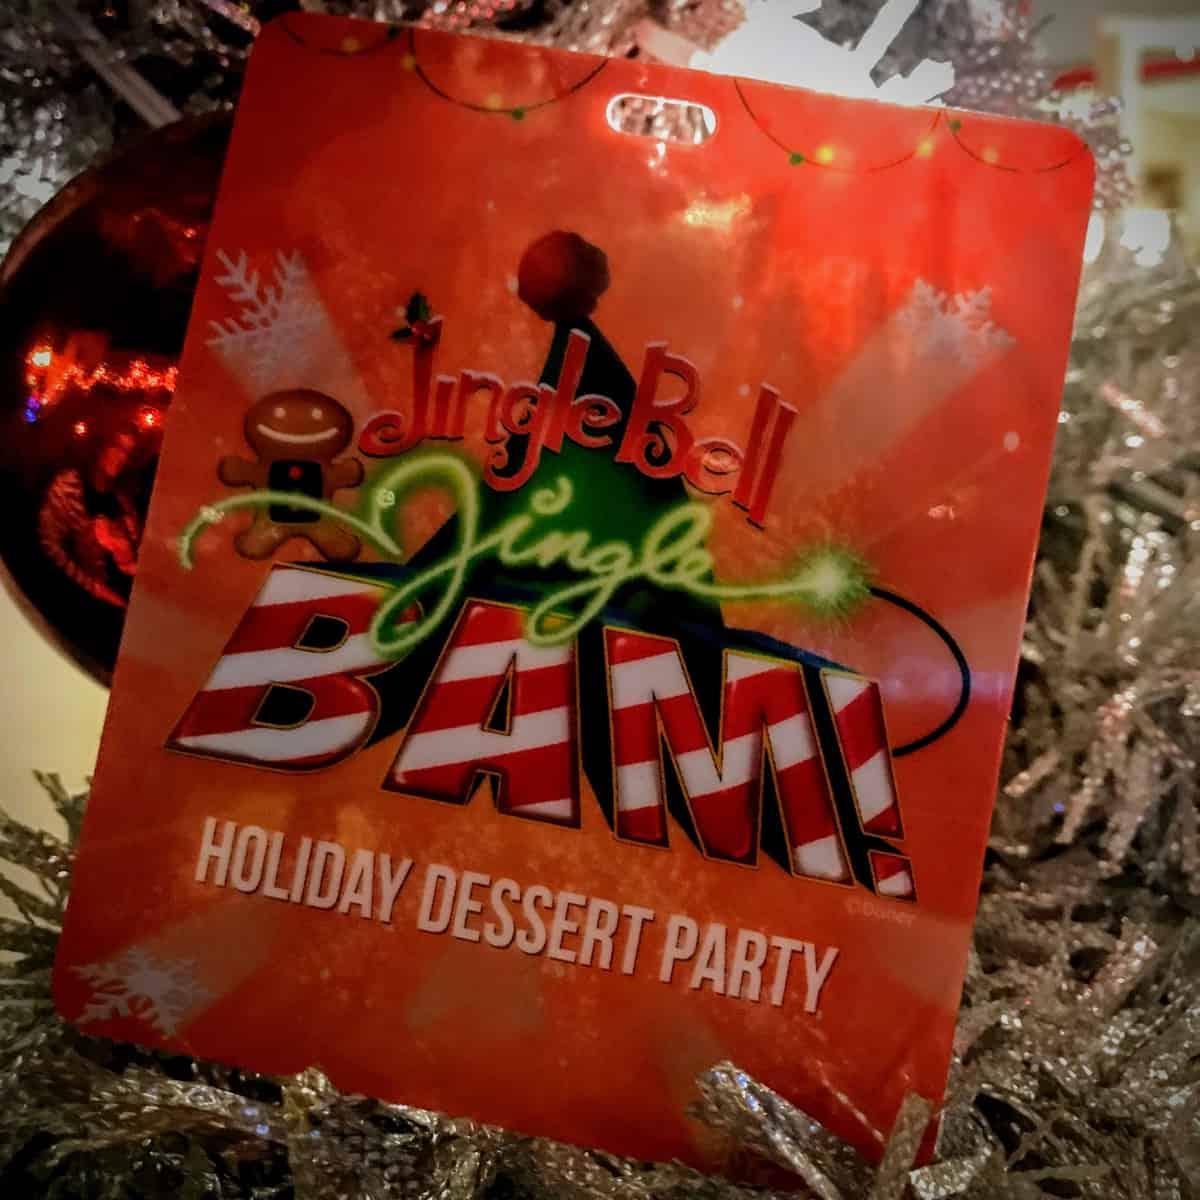 Jingle Bell, Jingle BAM Dessert Party